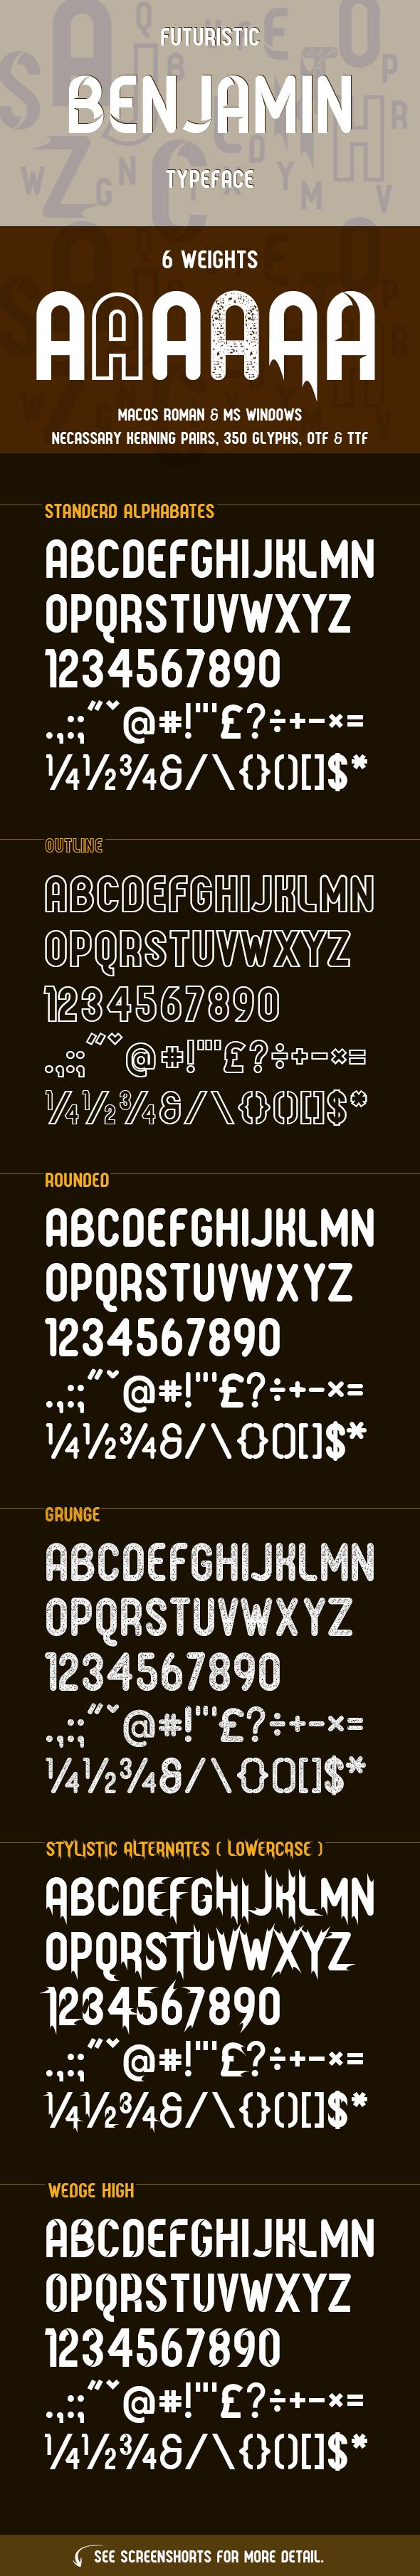 Benjamin Typeface - Futuristic Decorative